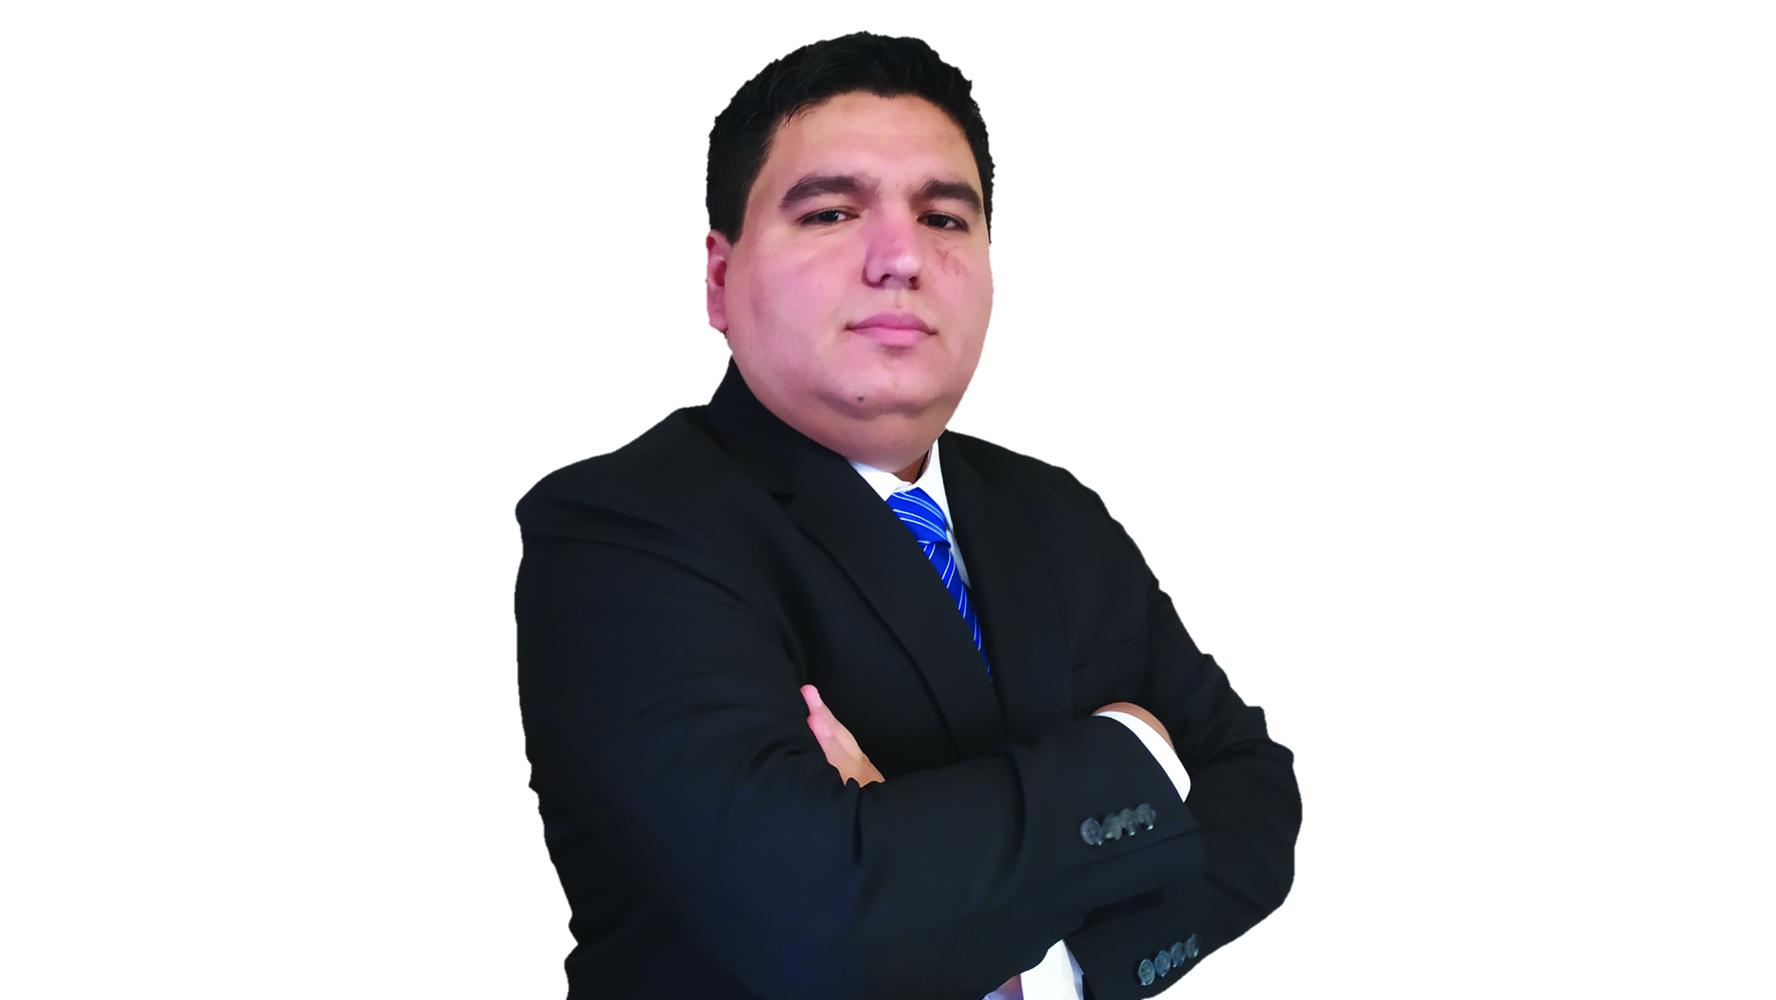 Oscar Villarreal Salazar